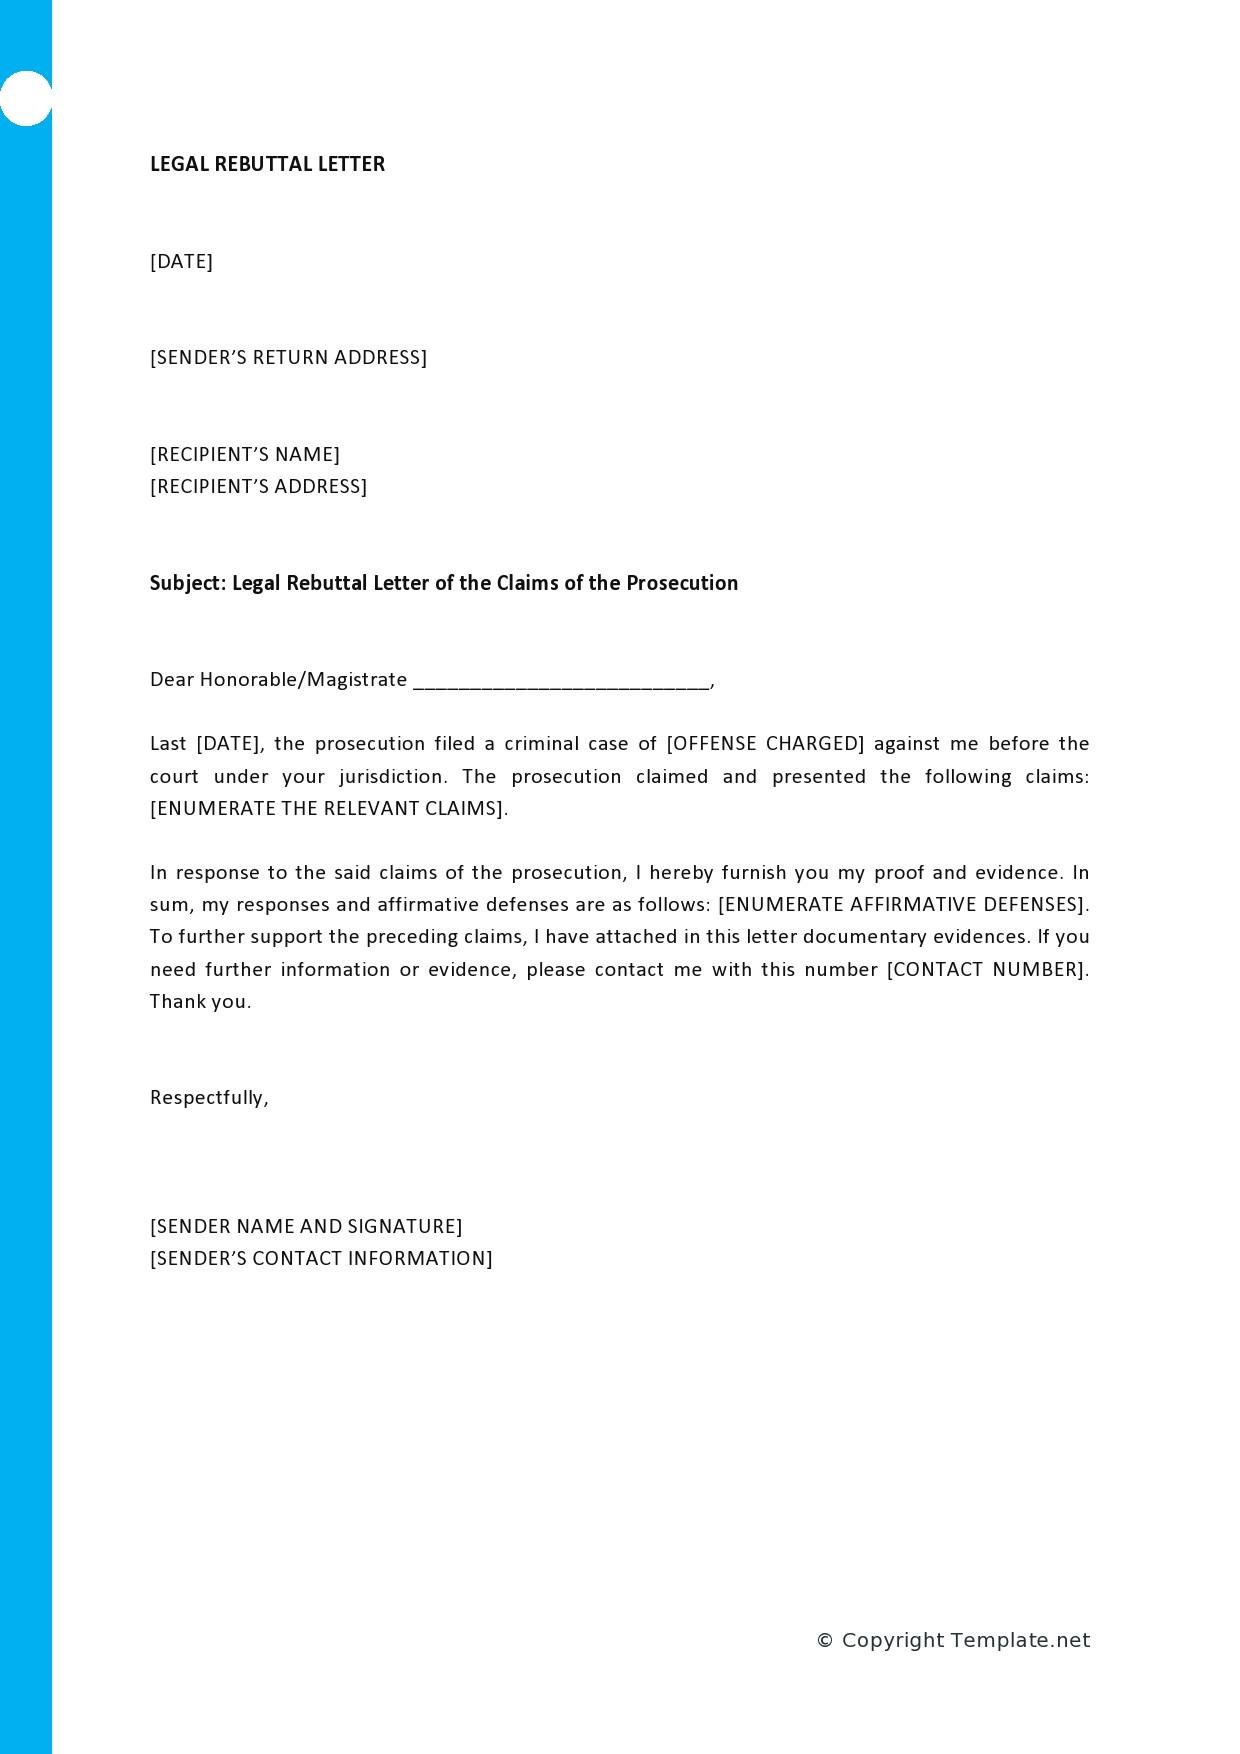 Free legal letter format 22